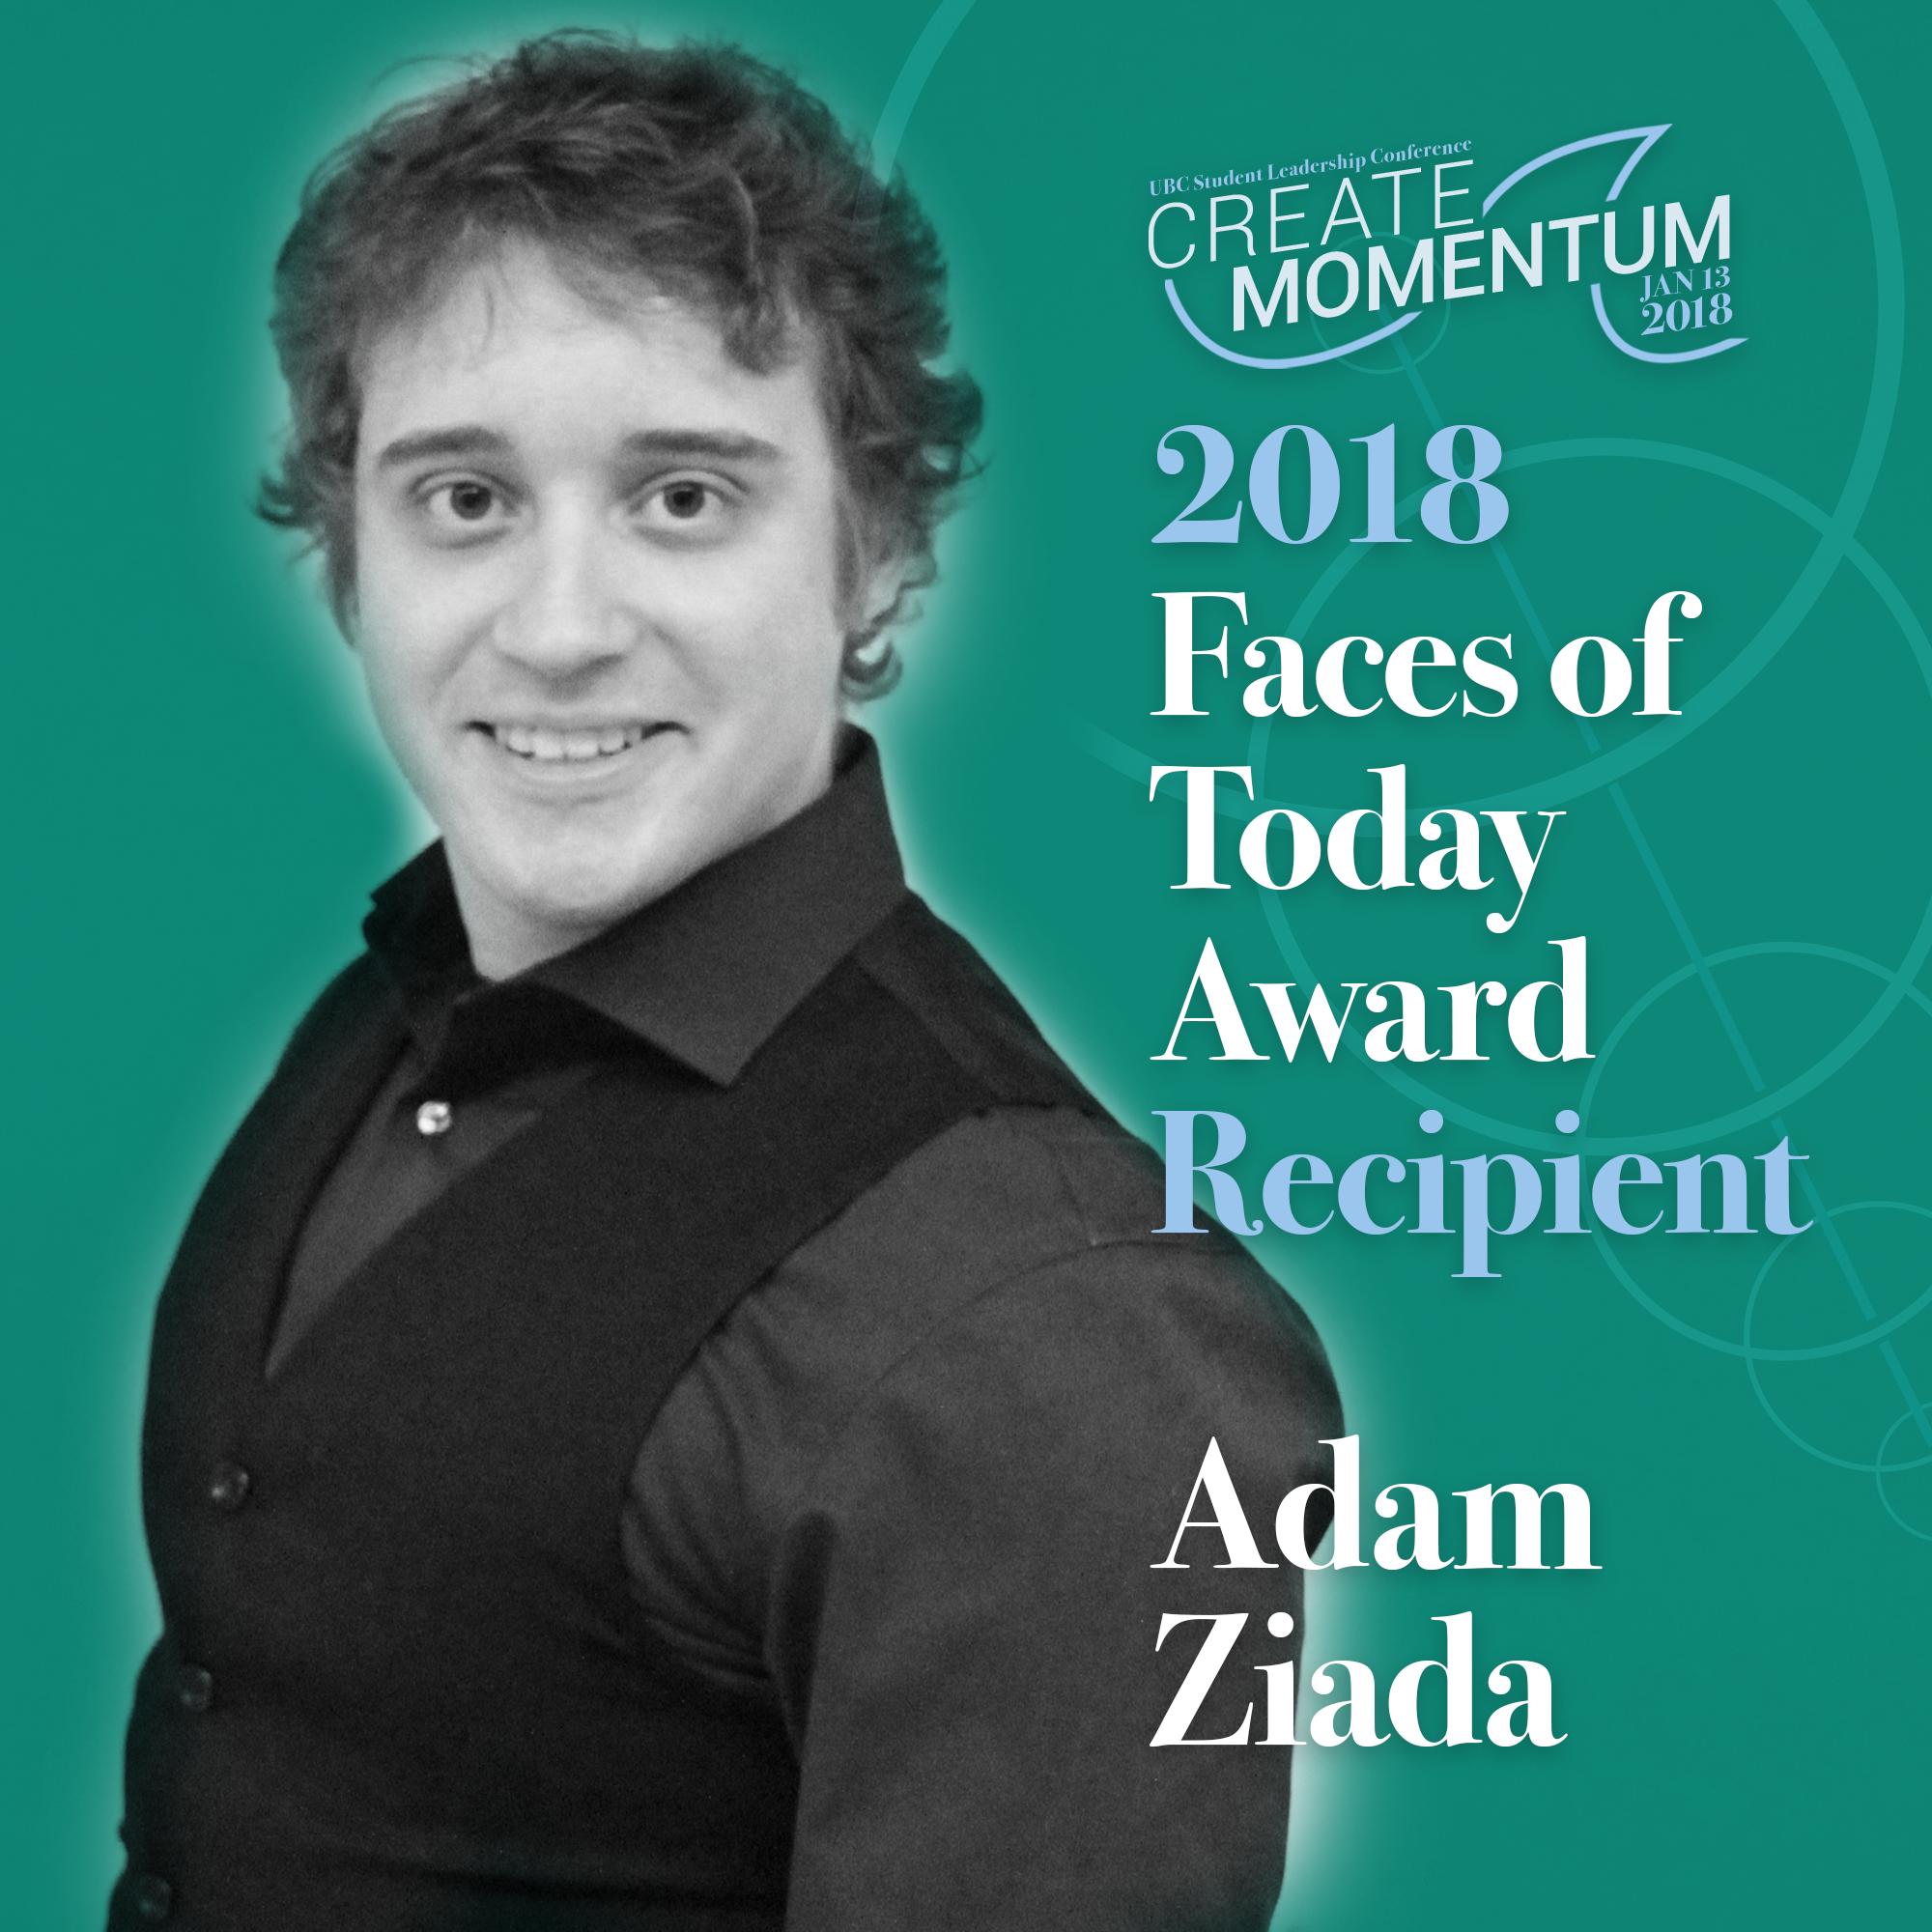 SLC Faces of Today Adam Ziada